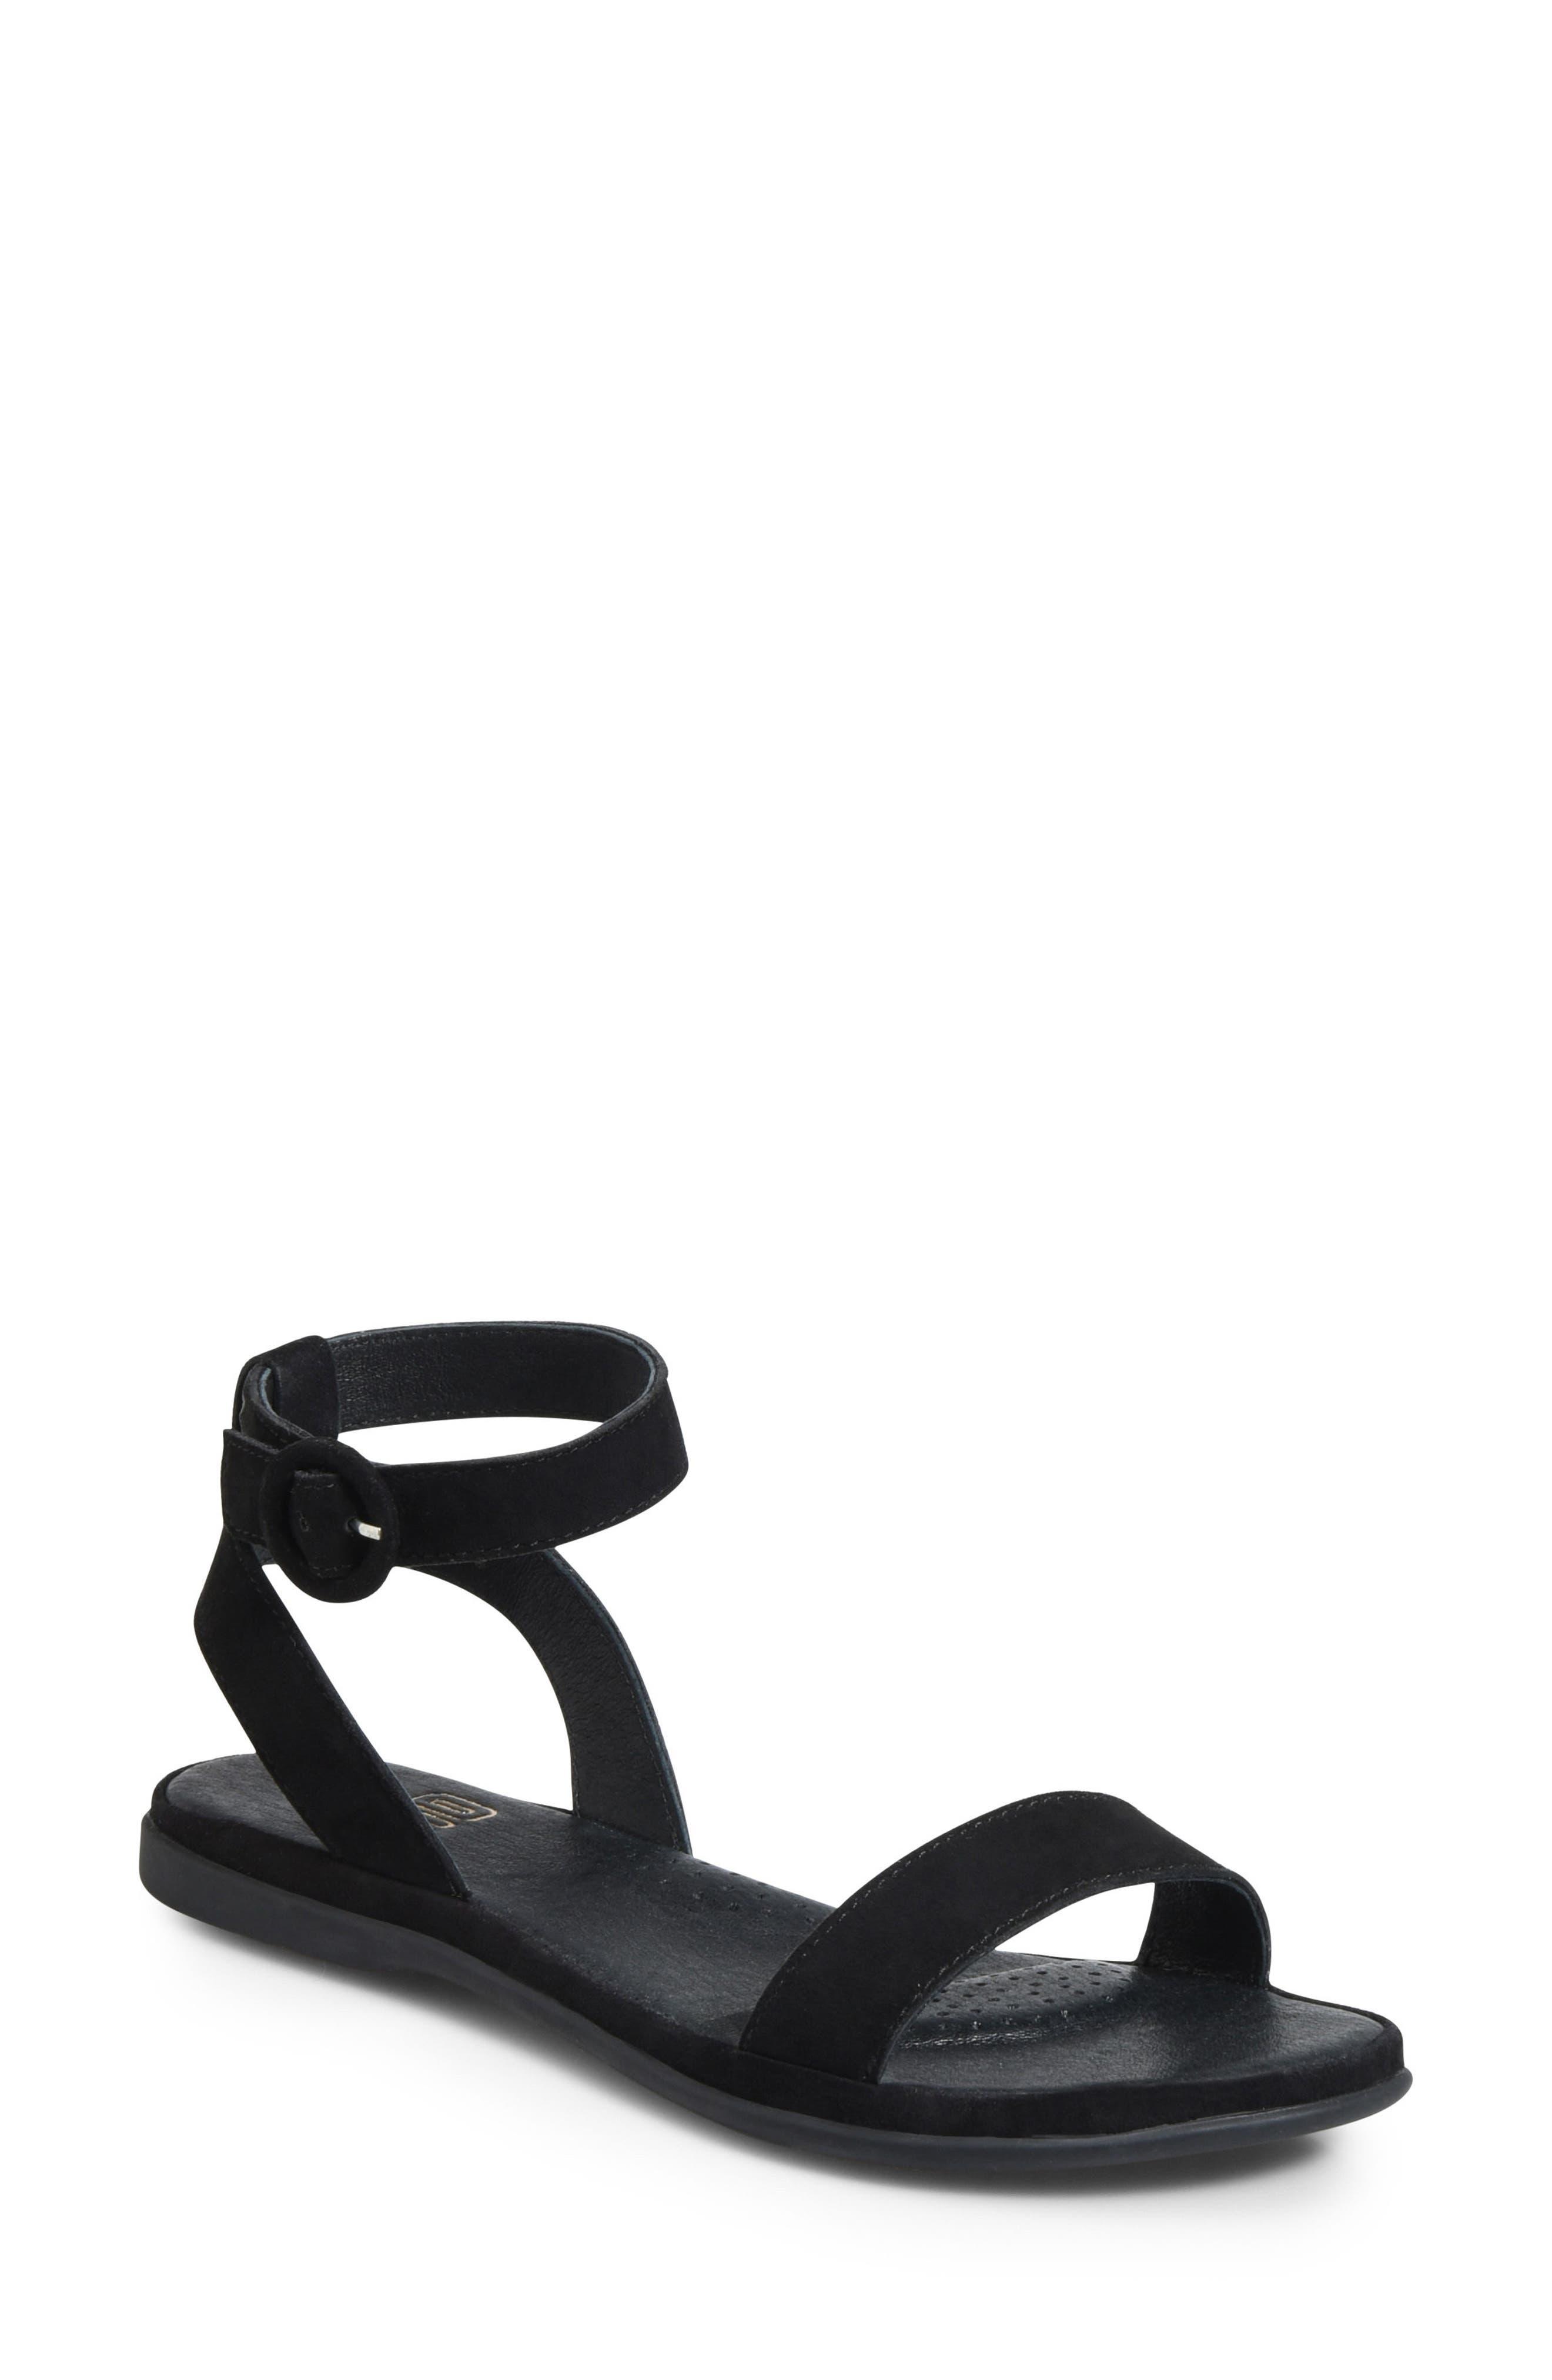 Stellan Sandal,                             Main thumbnail 1, color,                             BLACK SUEDE